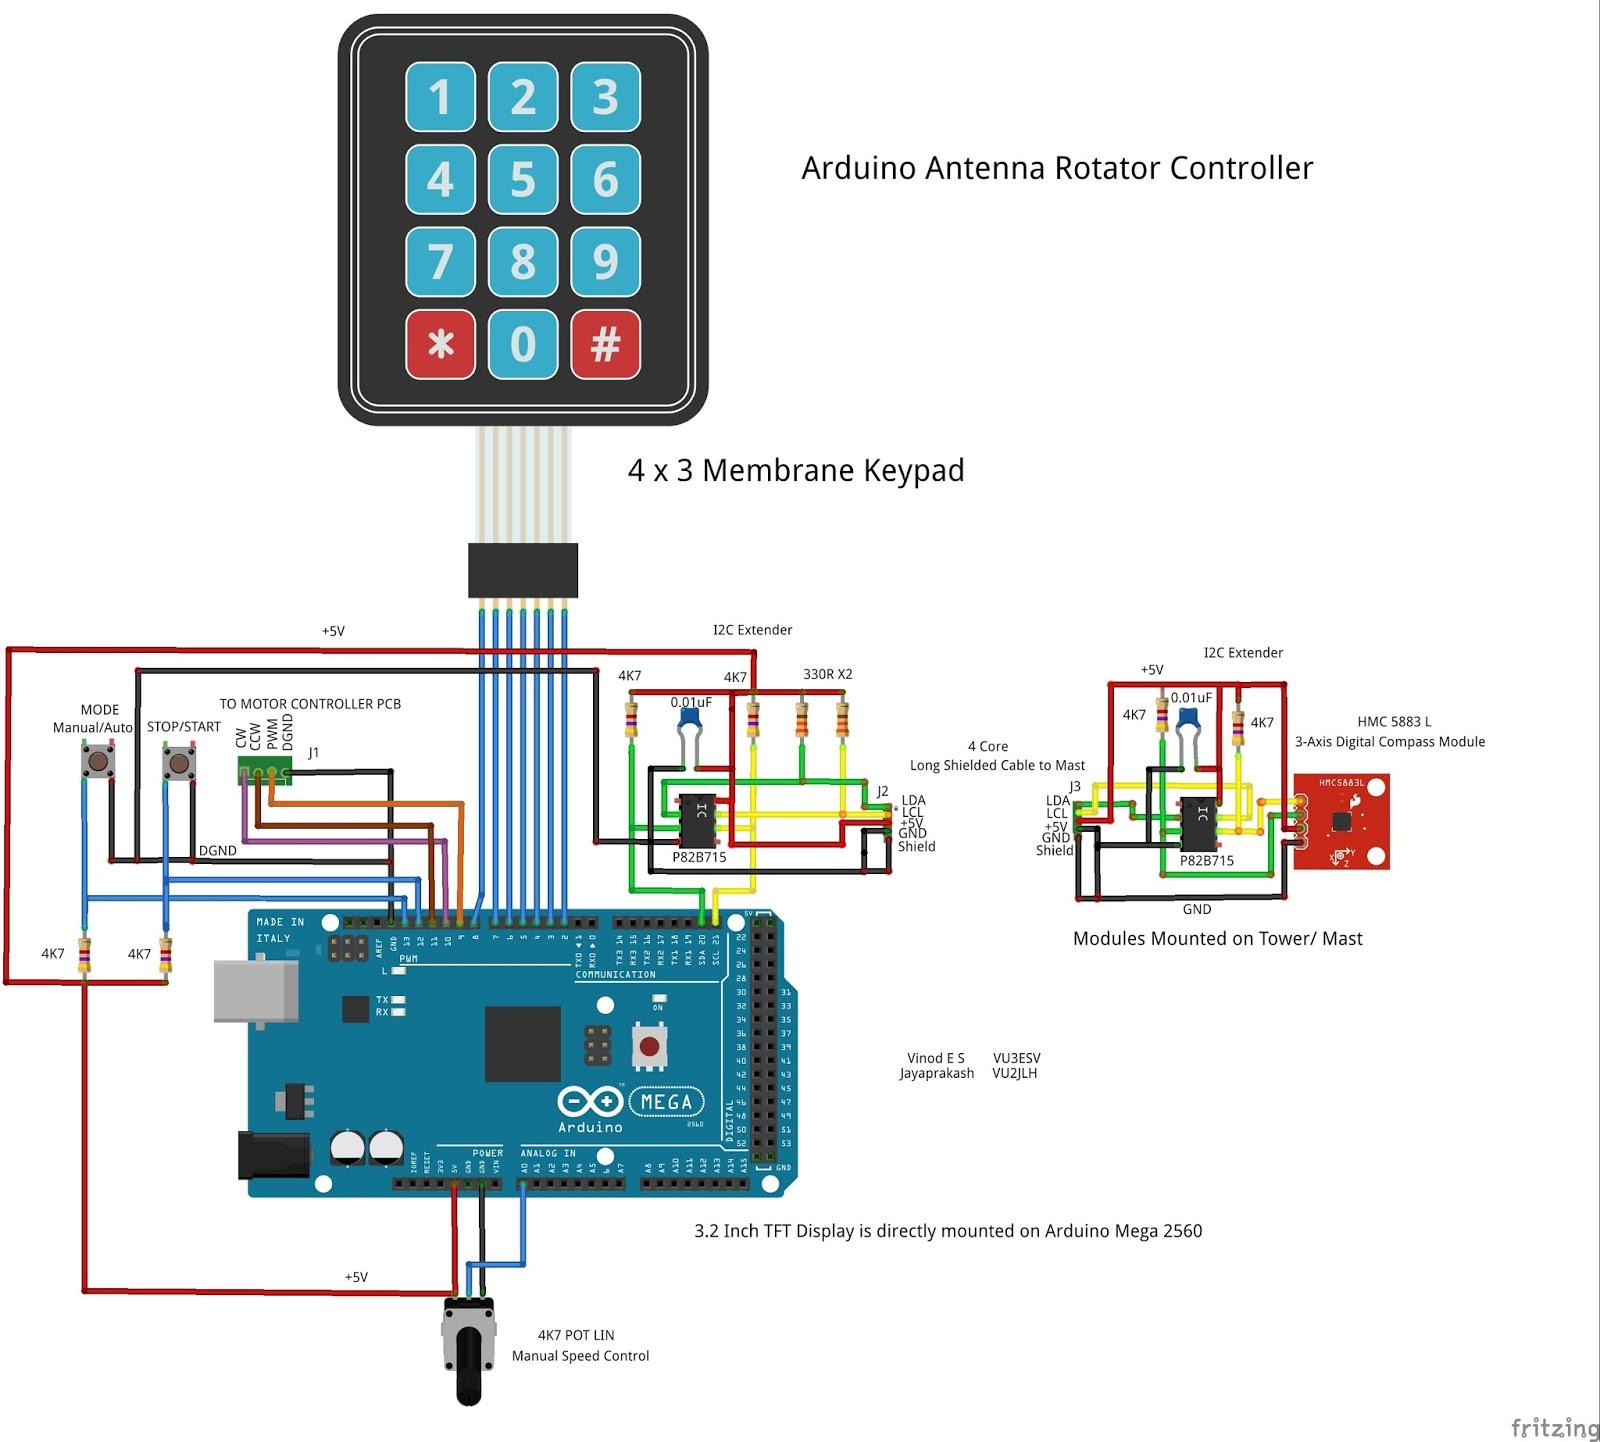 100nF: Arduino Mega2560 based Antenna Rotator Controller on arduino nano schematic, arduino mega 2560 map, arduino mega 2560 board, arduino speaker schematic, arduino mega 2560 led, arduino mega layout, arduino uno schematic, arduino mega adk, arduino mega 2560 programming, arduino schematic symbol, arduino mega 2560 pin mapping, arduino mega case, arduino mega size, arduino pro schematic, arduino mega specs, arduino microcontroller schematic, arduino mega 2560 datasheet, breadboard arduino schematic, arduino r3 schematic, arduino ethernet schematic,